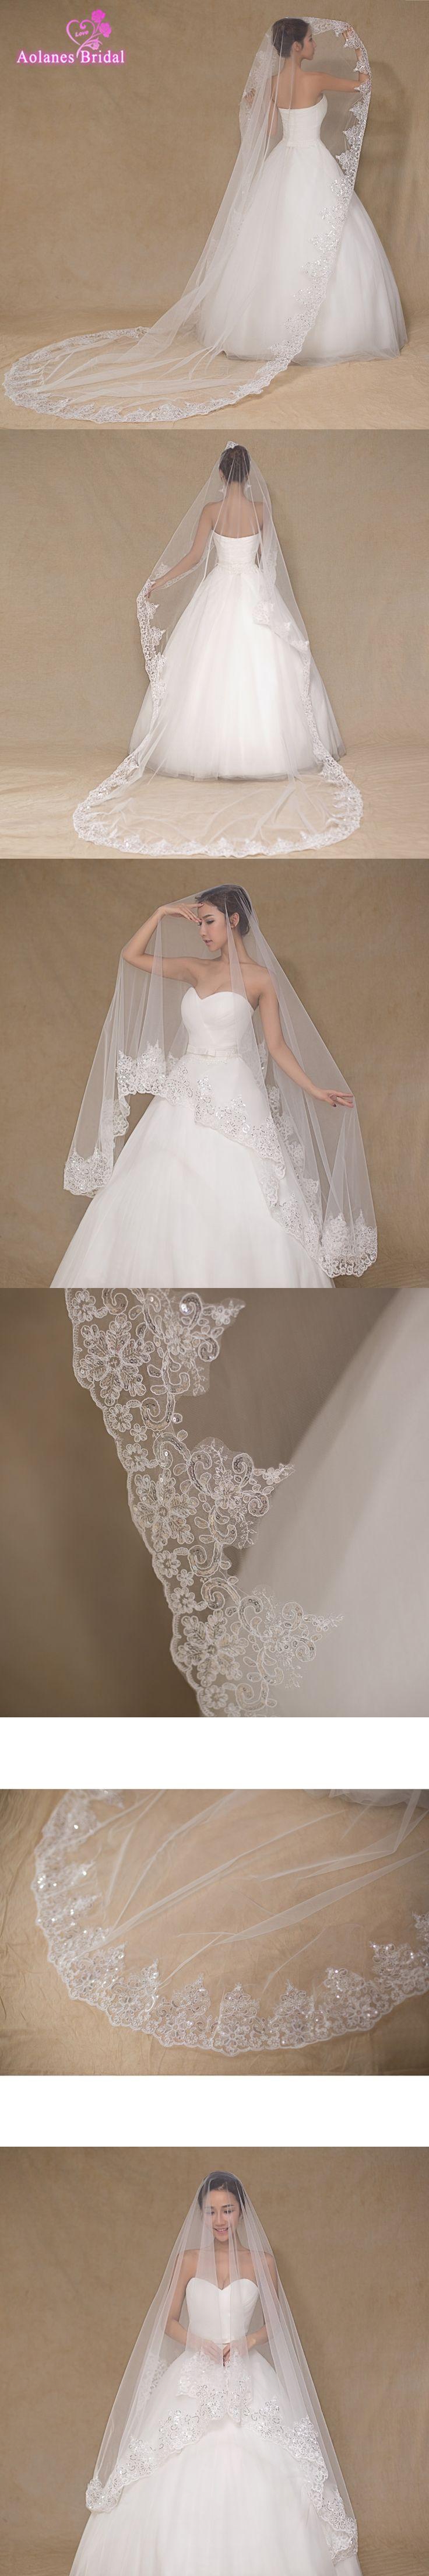 2017 Wedding Veils  Bridal Veil One Layer Handmade Beaded Sequins Appliques Edge Bridal Wedding Accessories Veil Ivory Color